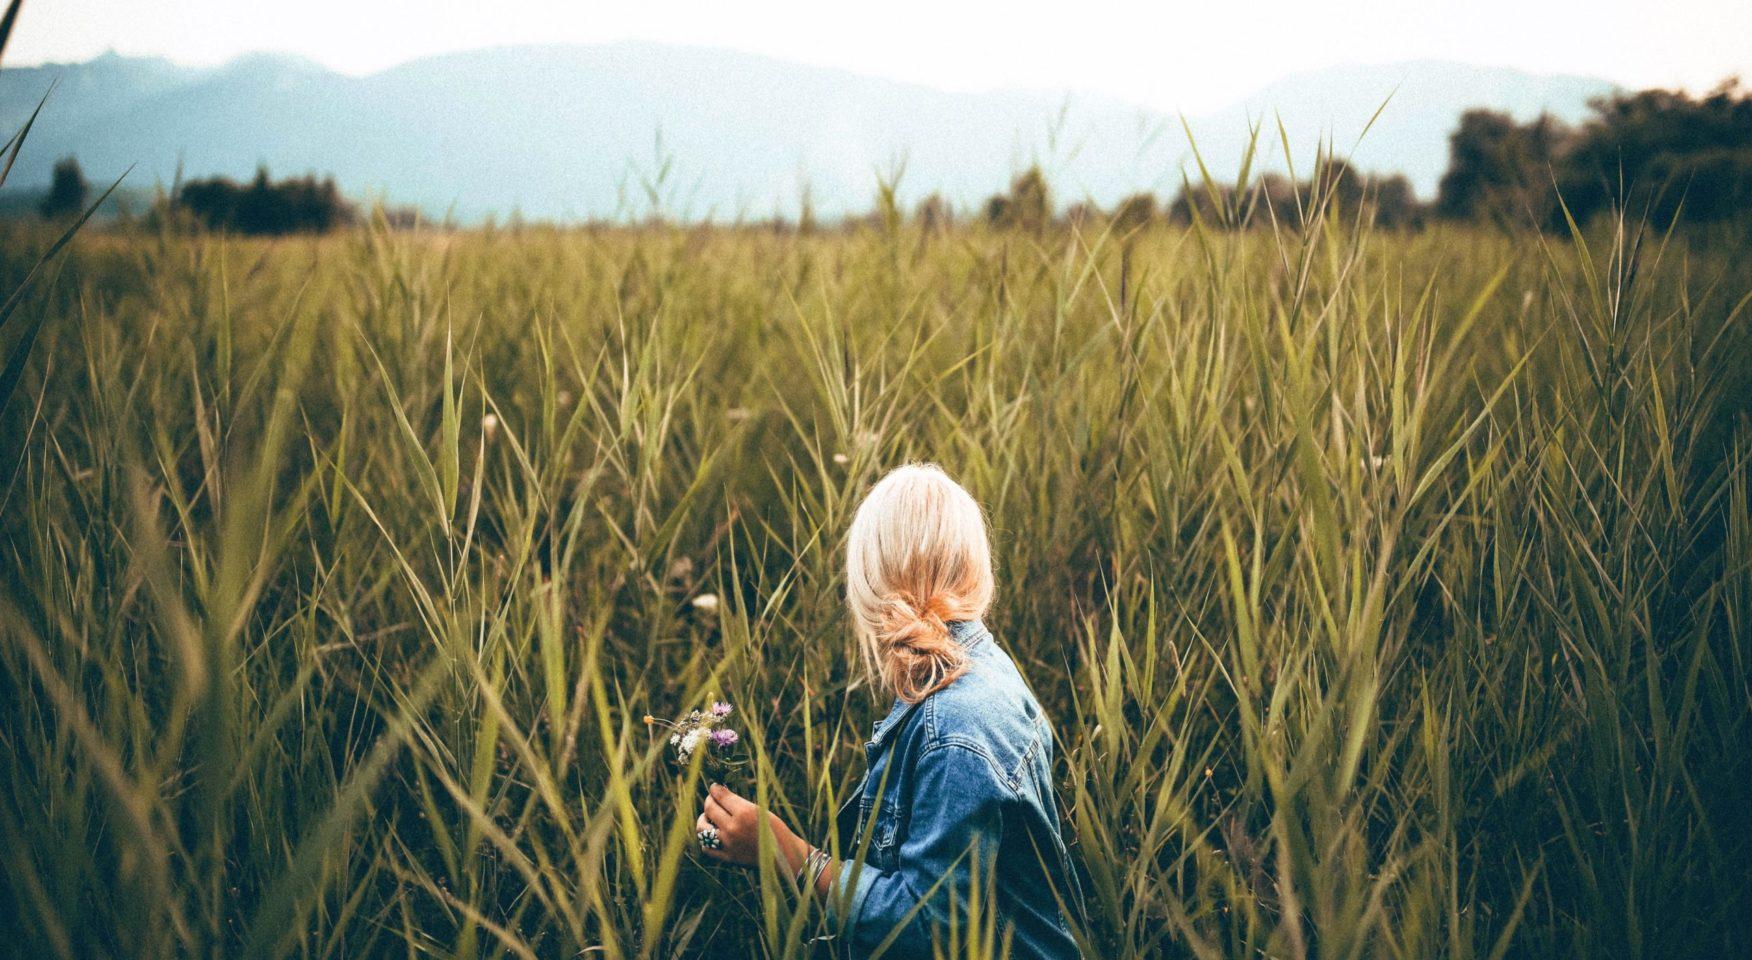 blonde woman in field of reeds